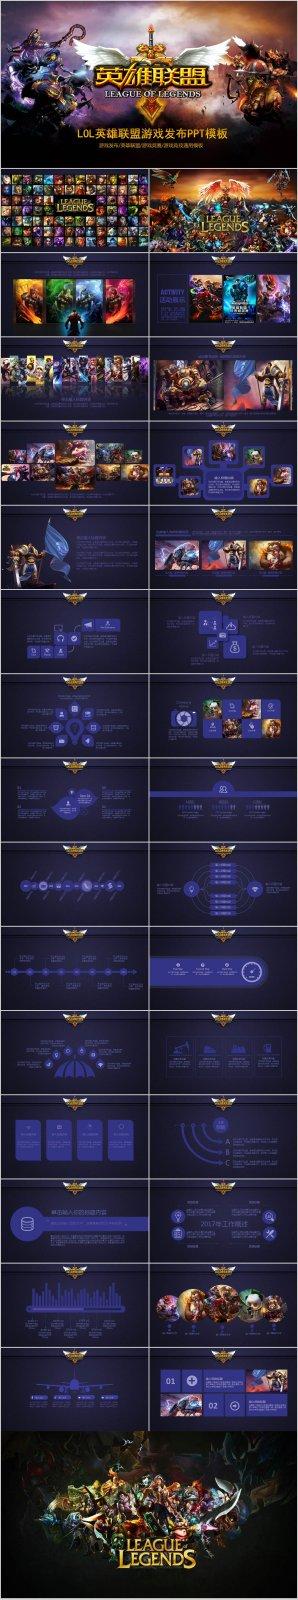 LOL英雄联盟网络游戏发布PPT模板